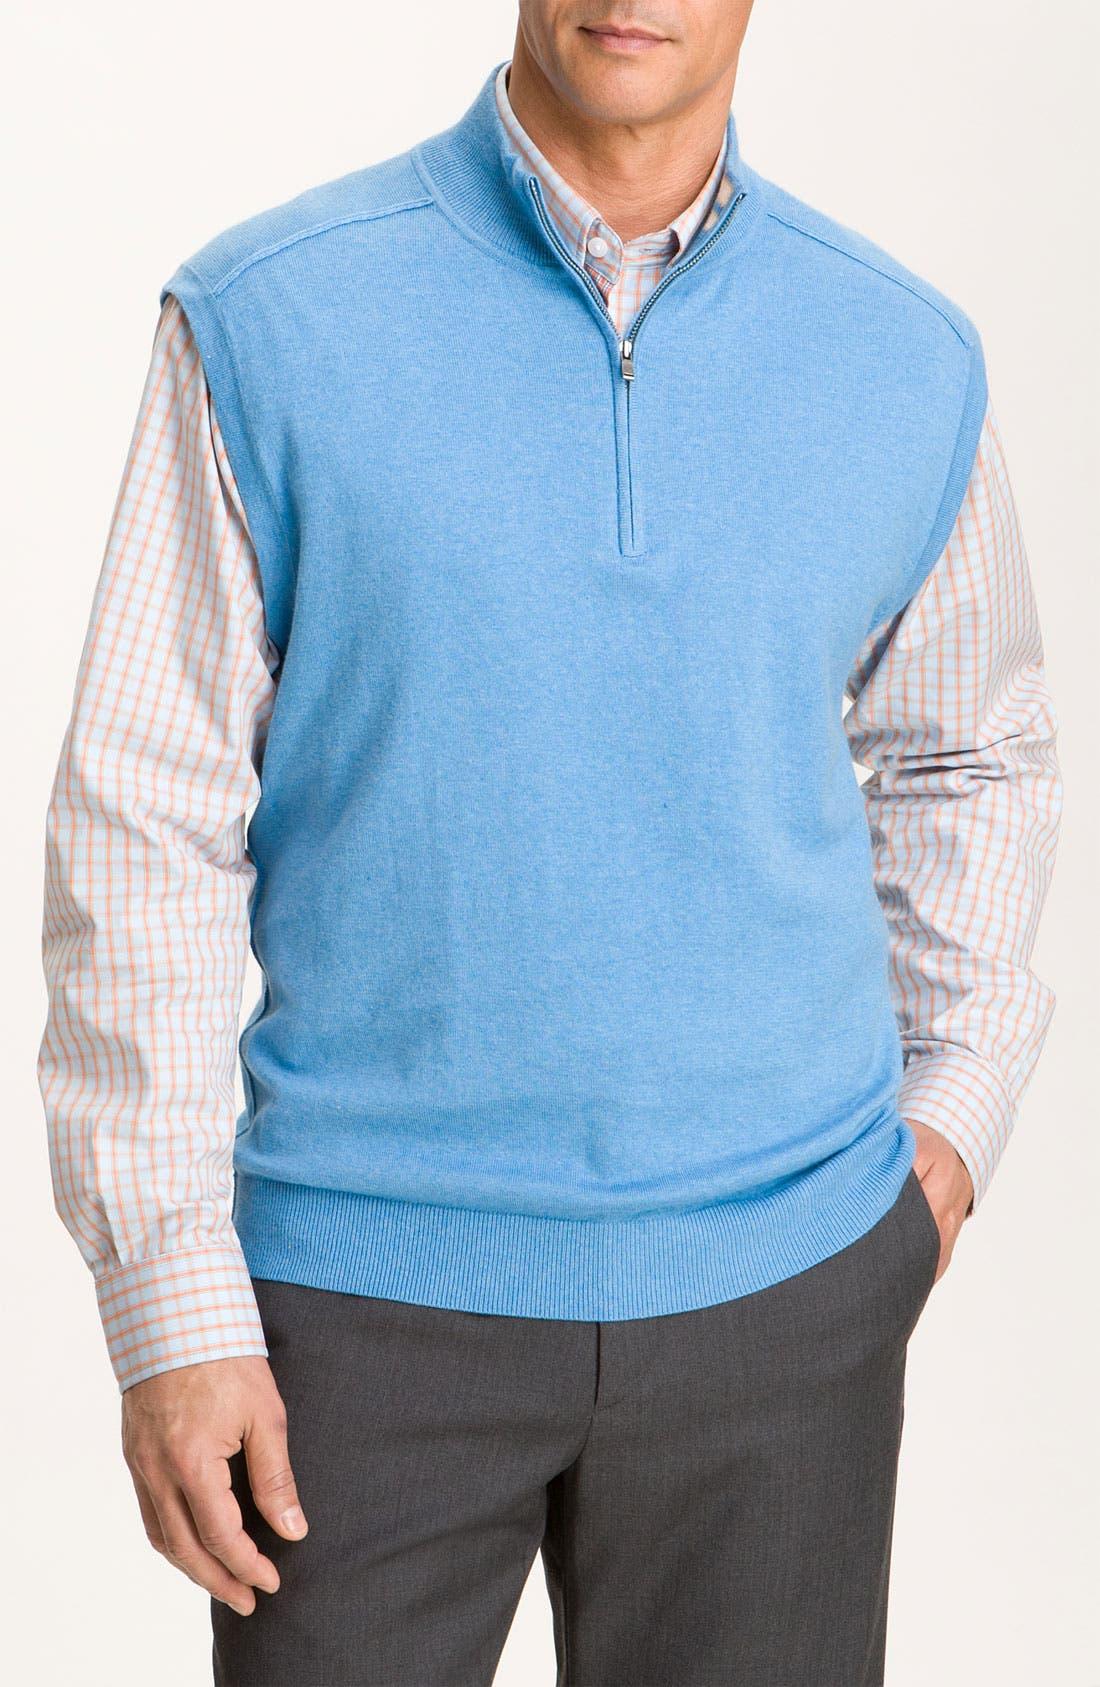 Main Image - Cutter & Buck 'Thomas' Half Zip Vest (Big & Tall) (Online Exclusive)